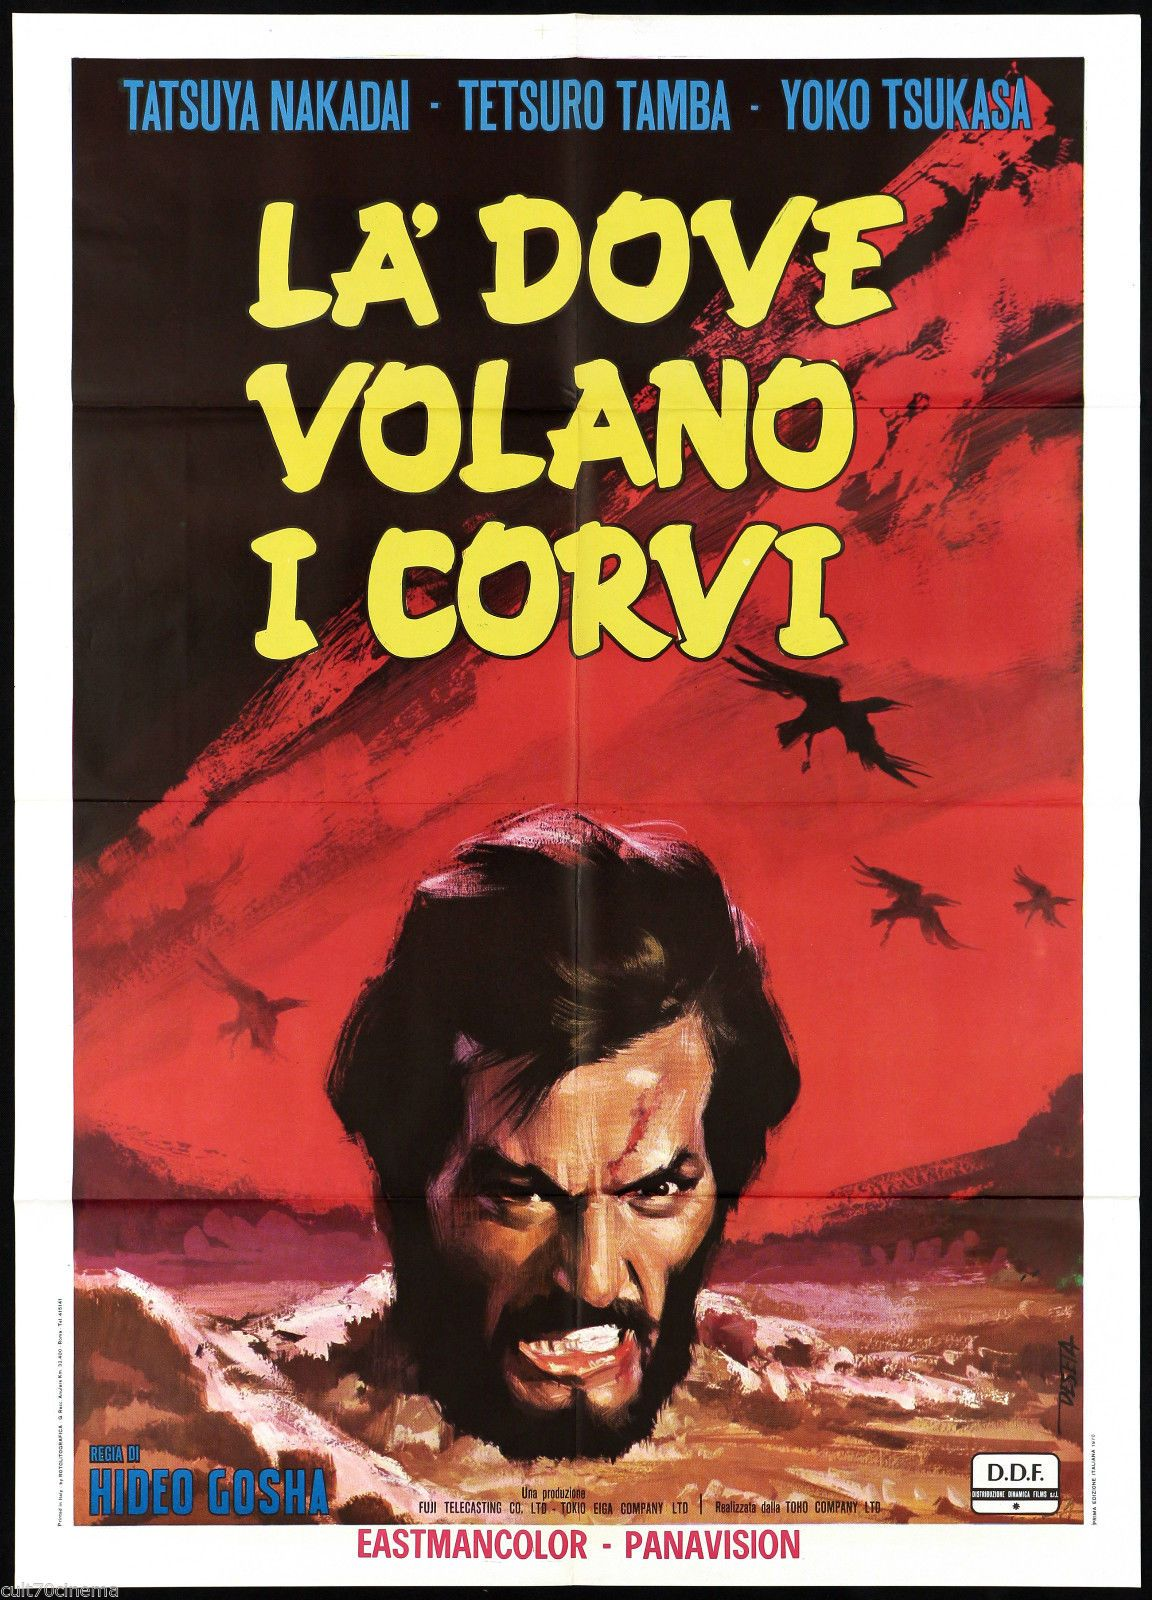 Là dove volano i corvi aka Goyôkin (1969) (Italy) | Movie titles, Comic  book cover, Comic books